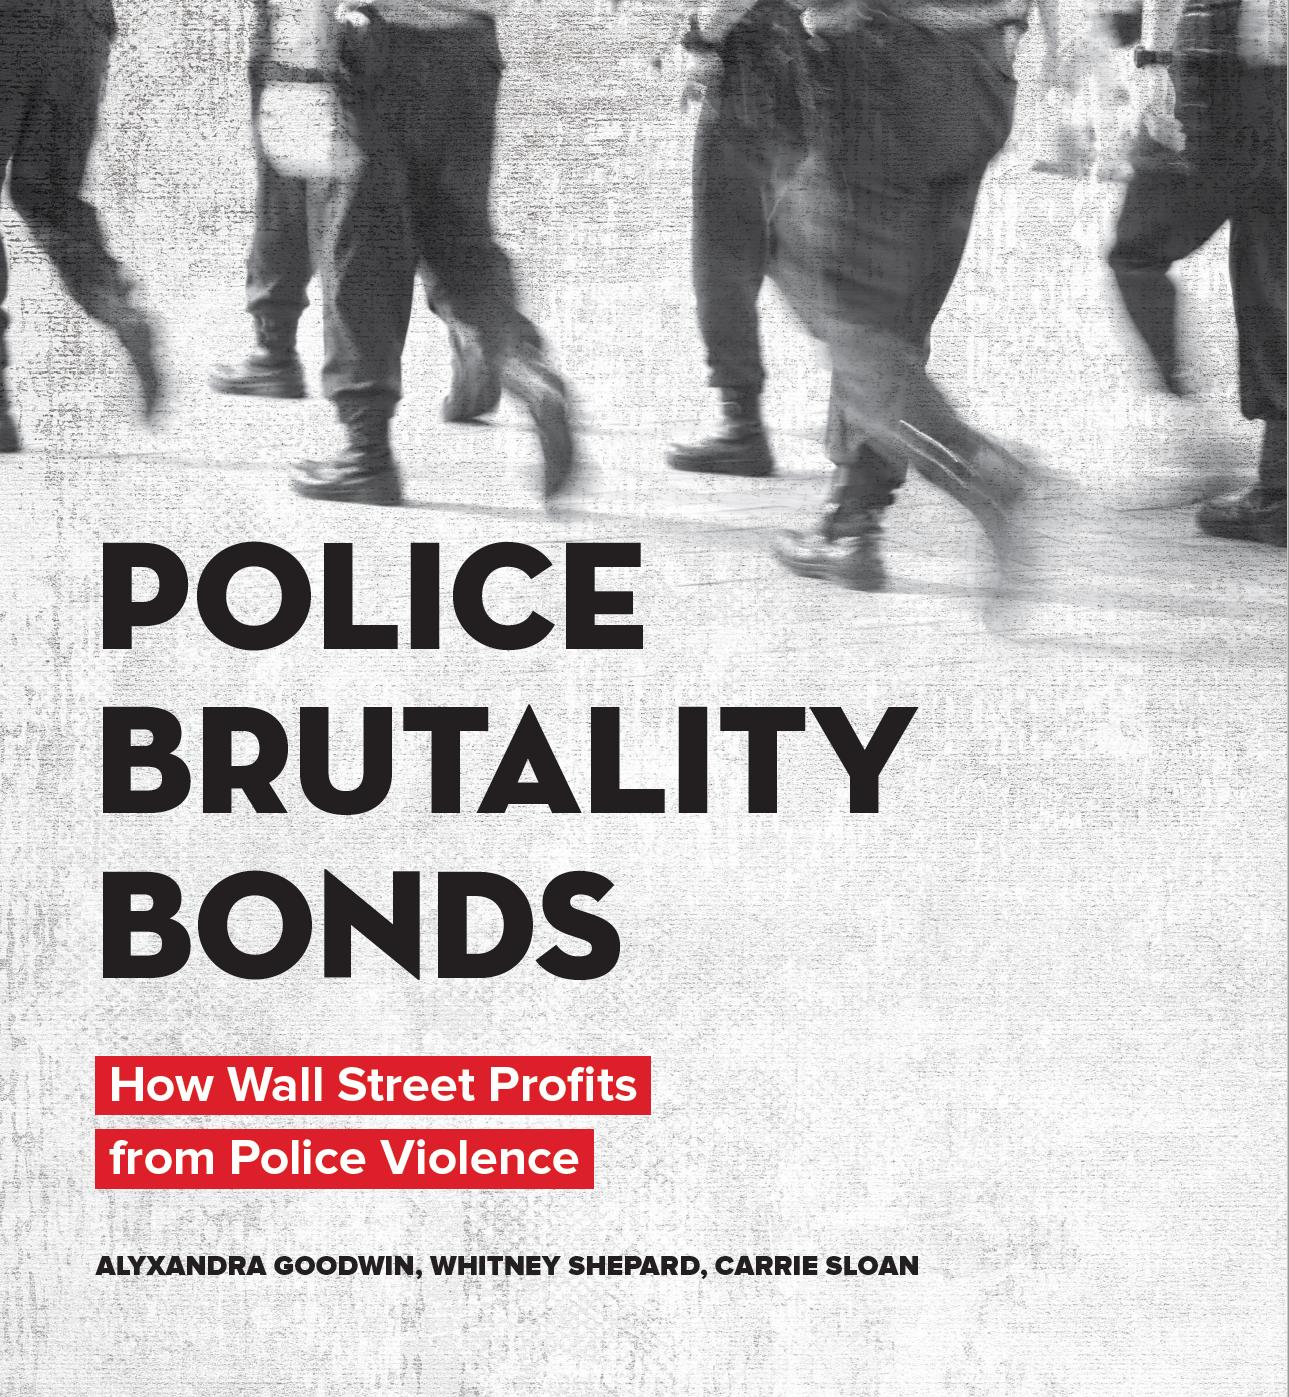 PoliceBrutalityBonds.png